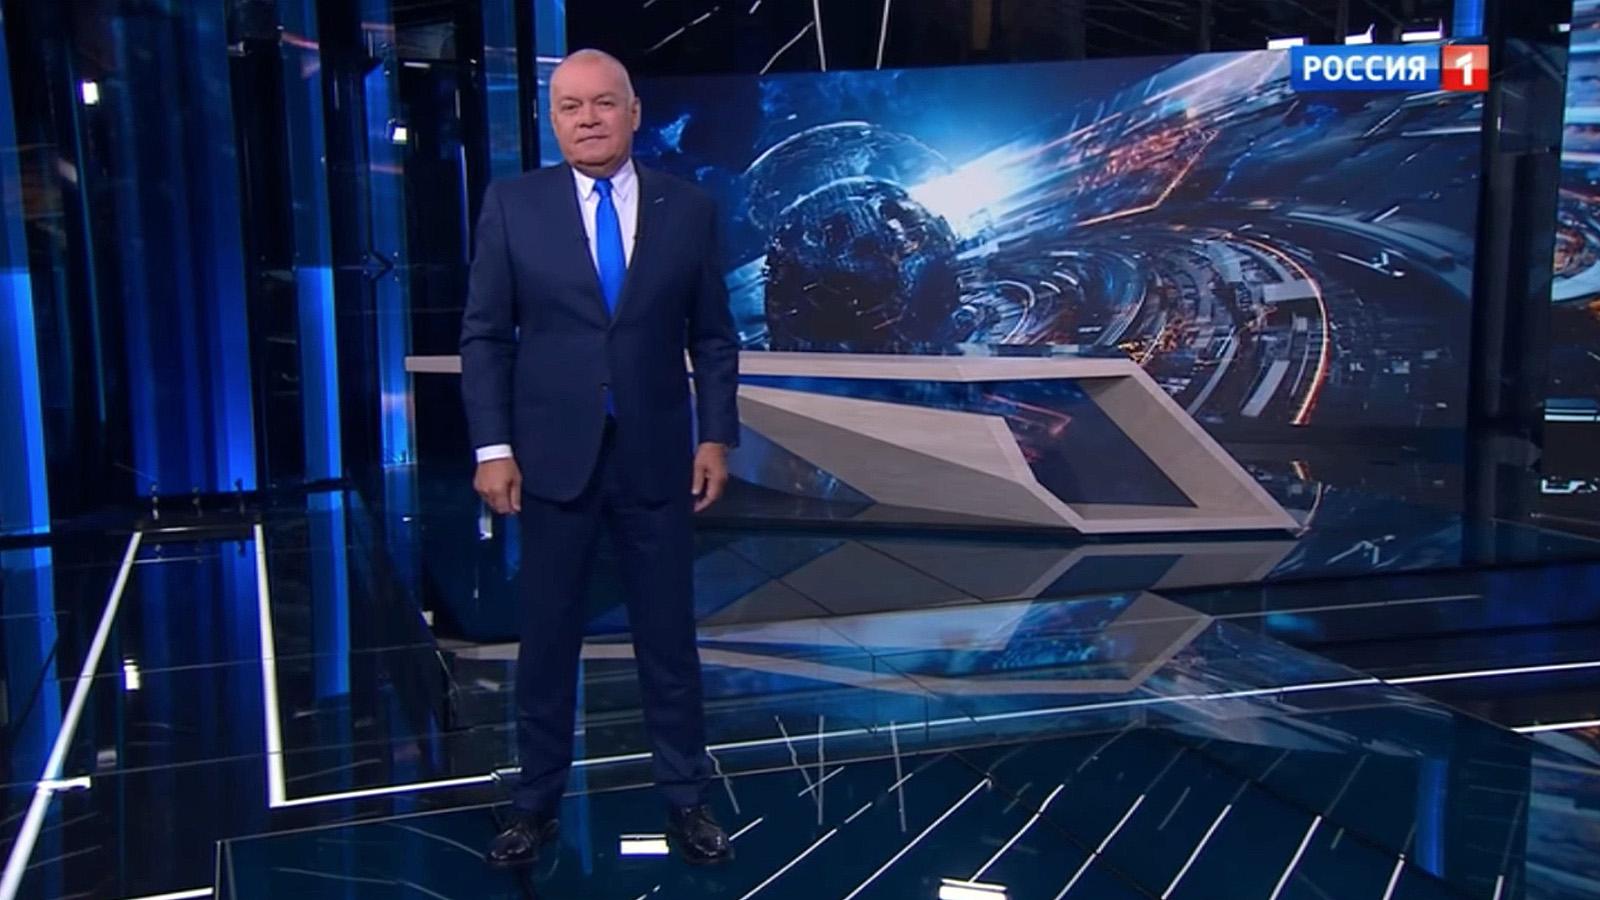 NCS_Russia-1-Vesti-Studio_0004